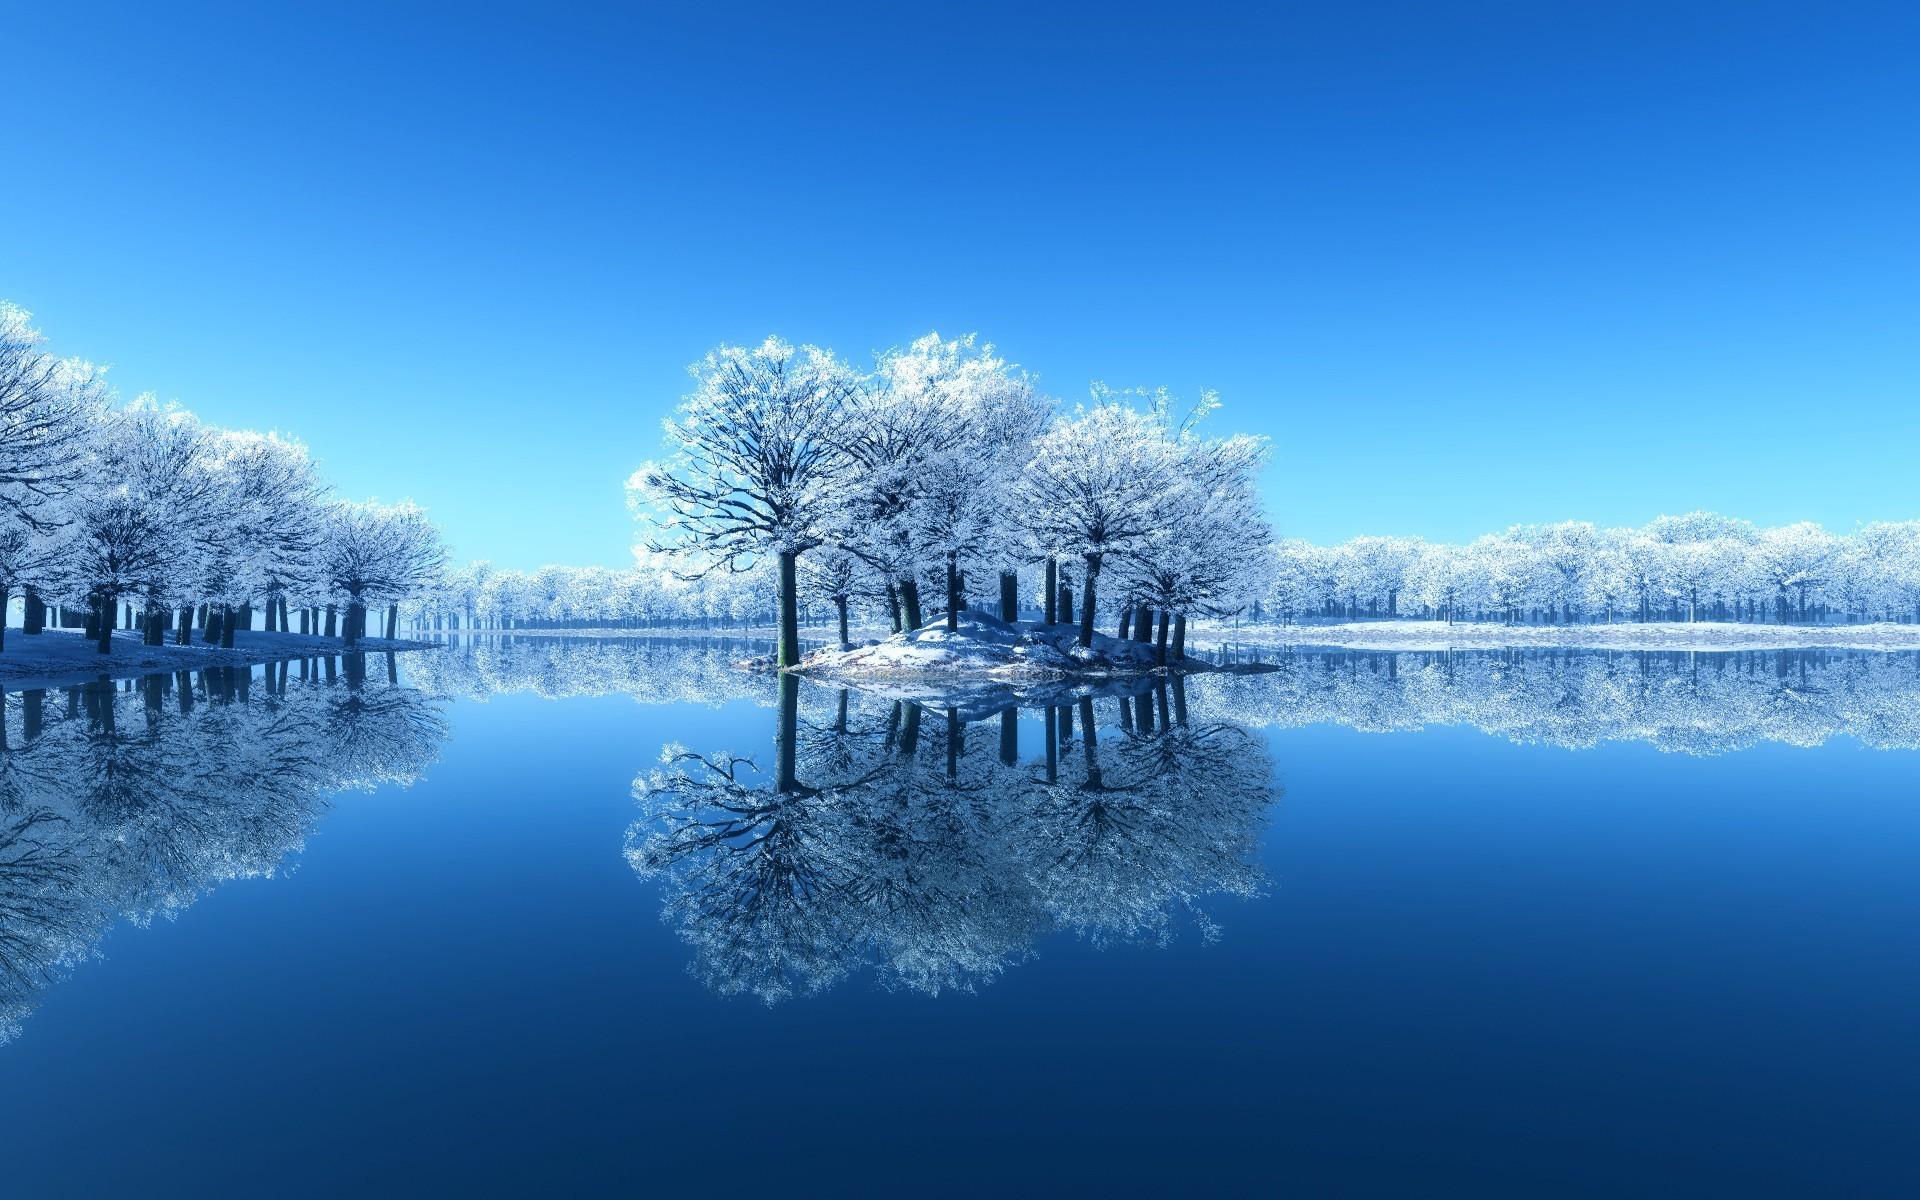 winter scenery backgrounds | Free Download Winter Scenery .